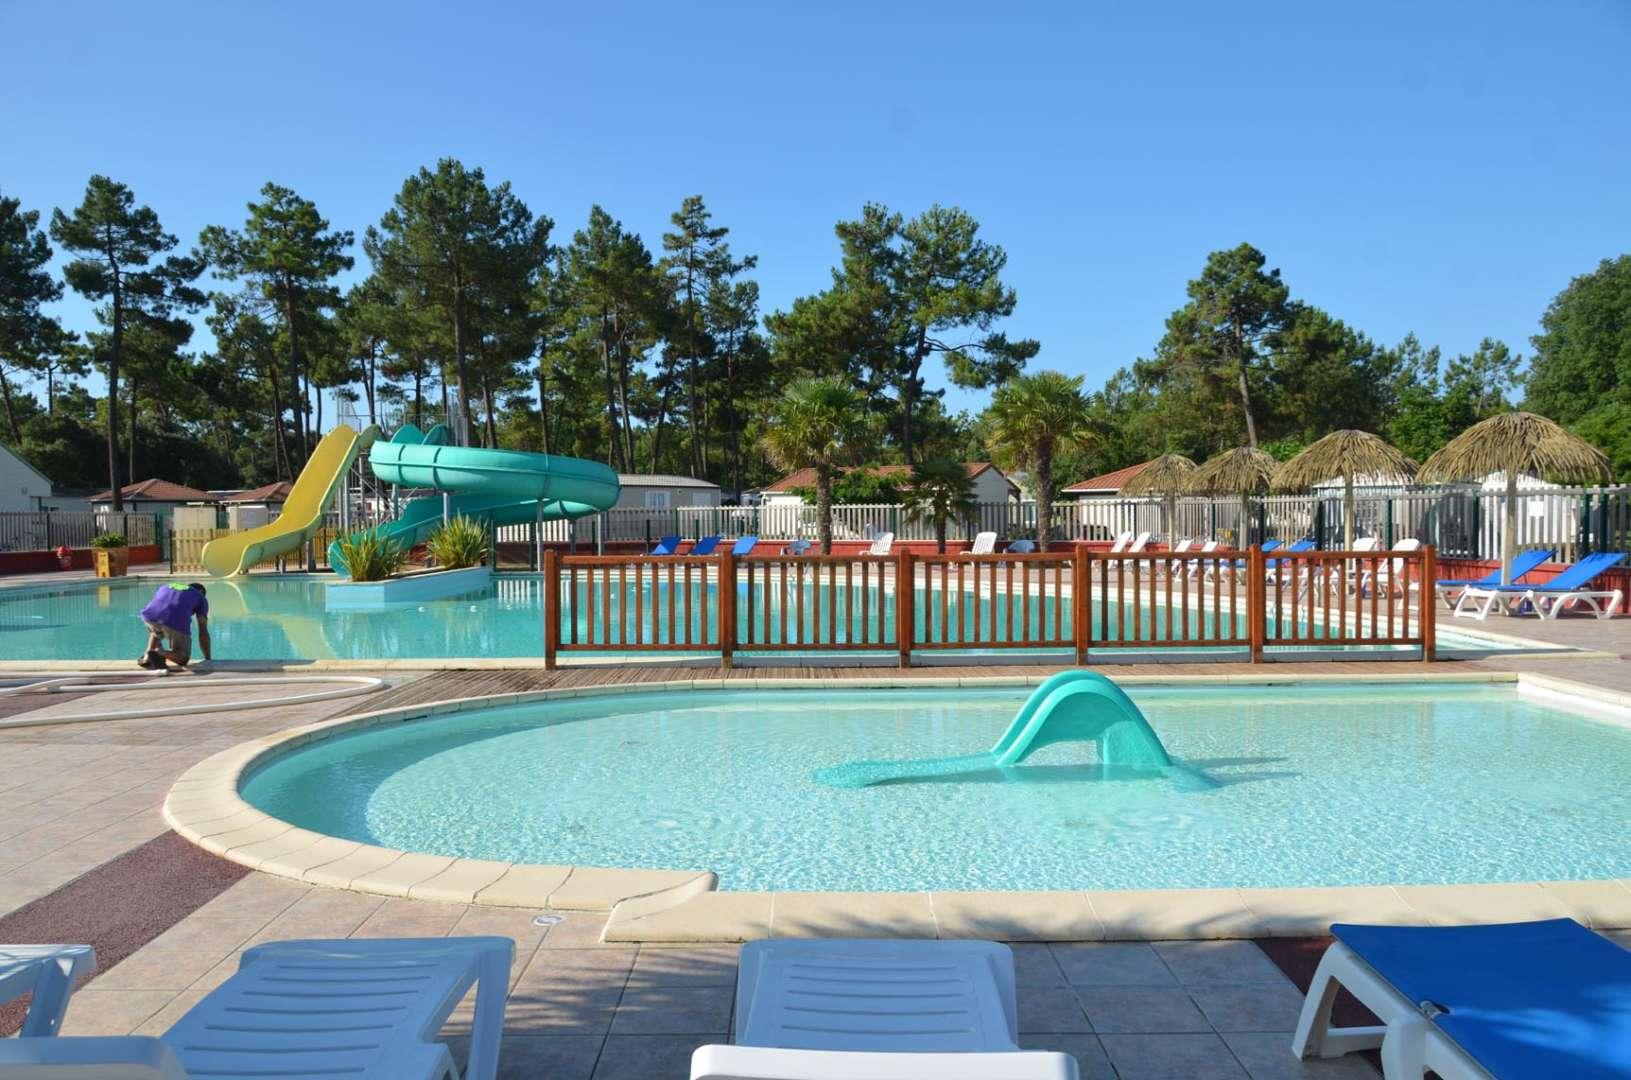 piscine camping le california en vendee camping saint jean de monts le california